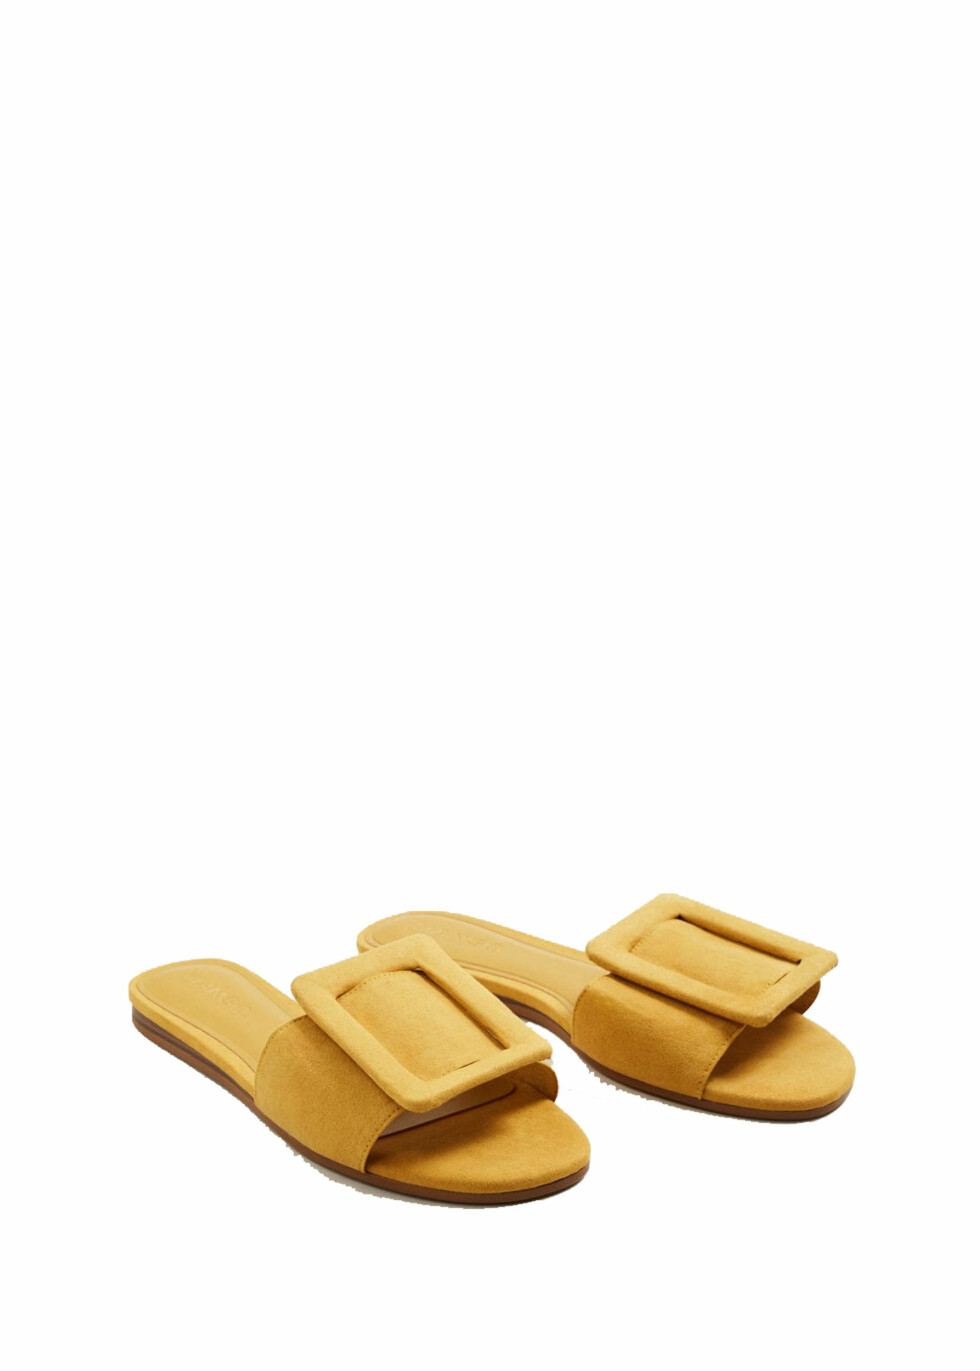 Sandaler fra Mango  269,-  https://shop.mango.com/no/damer/sko-flate-sandaler/flat-sandal-med-spenne_23017024.html?c=15&n=1&s=search